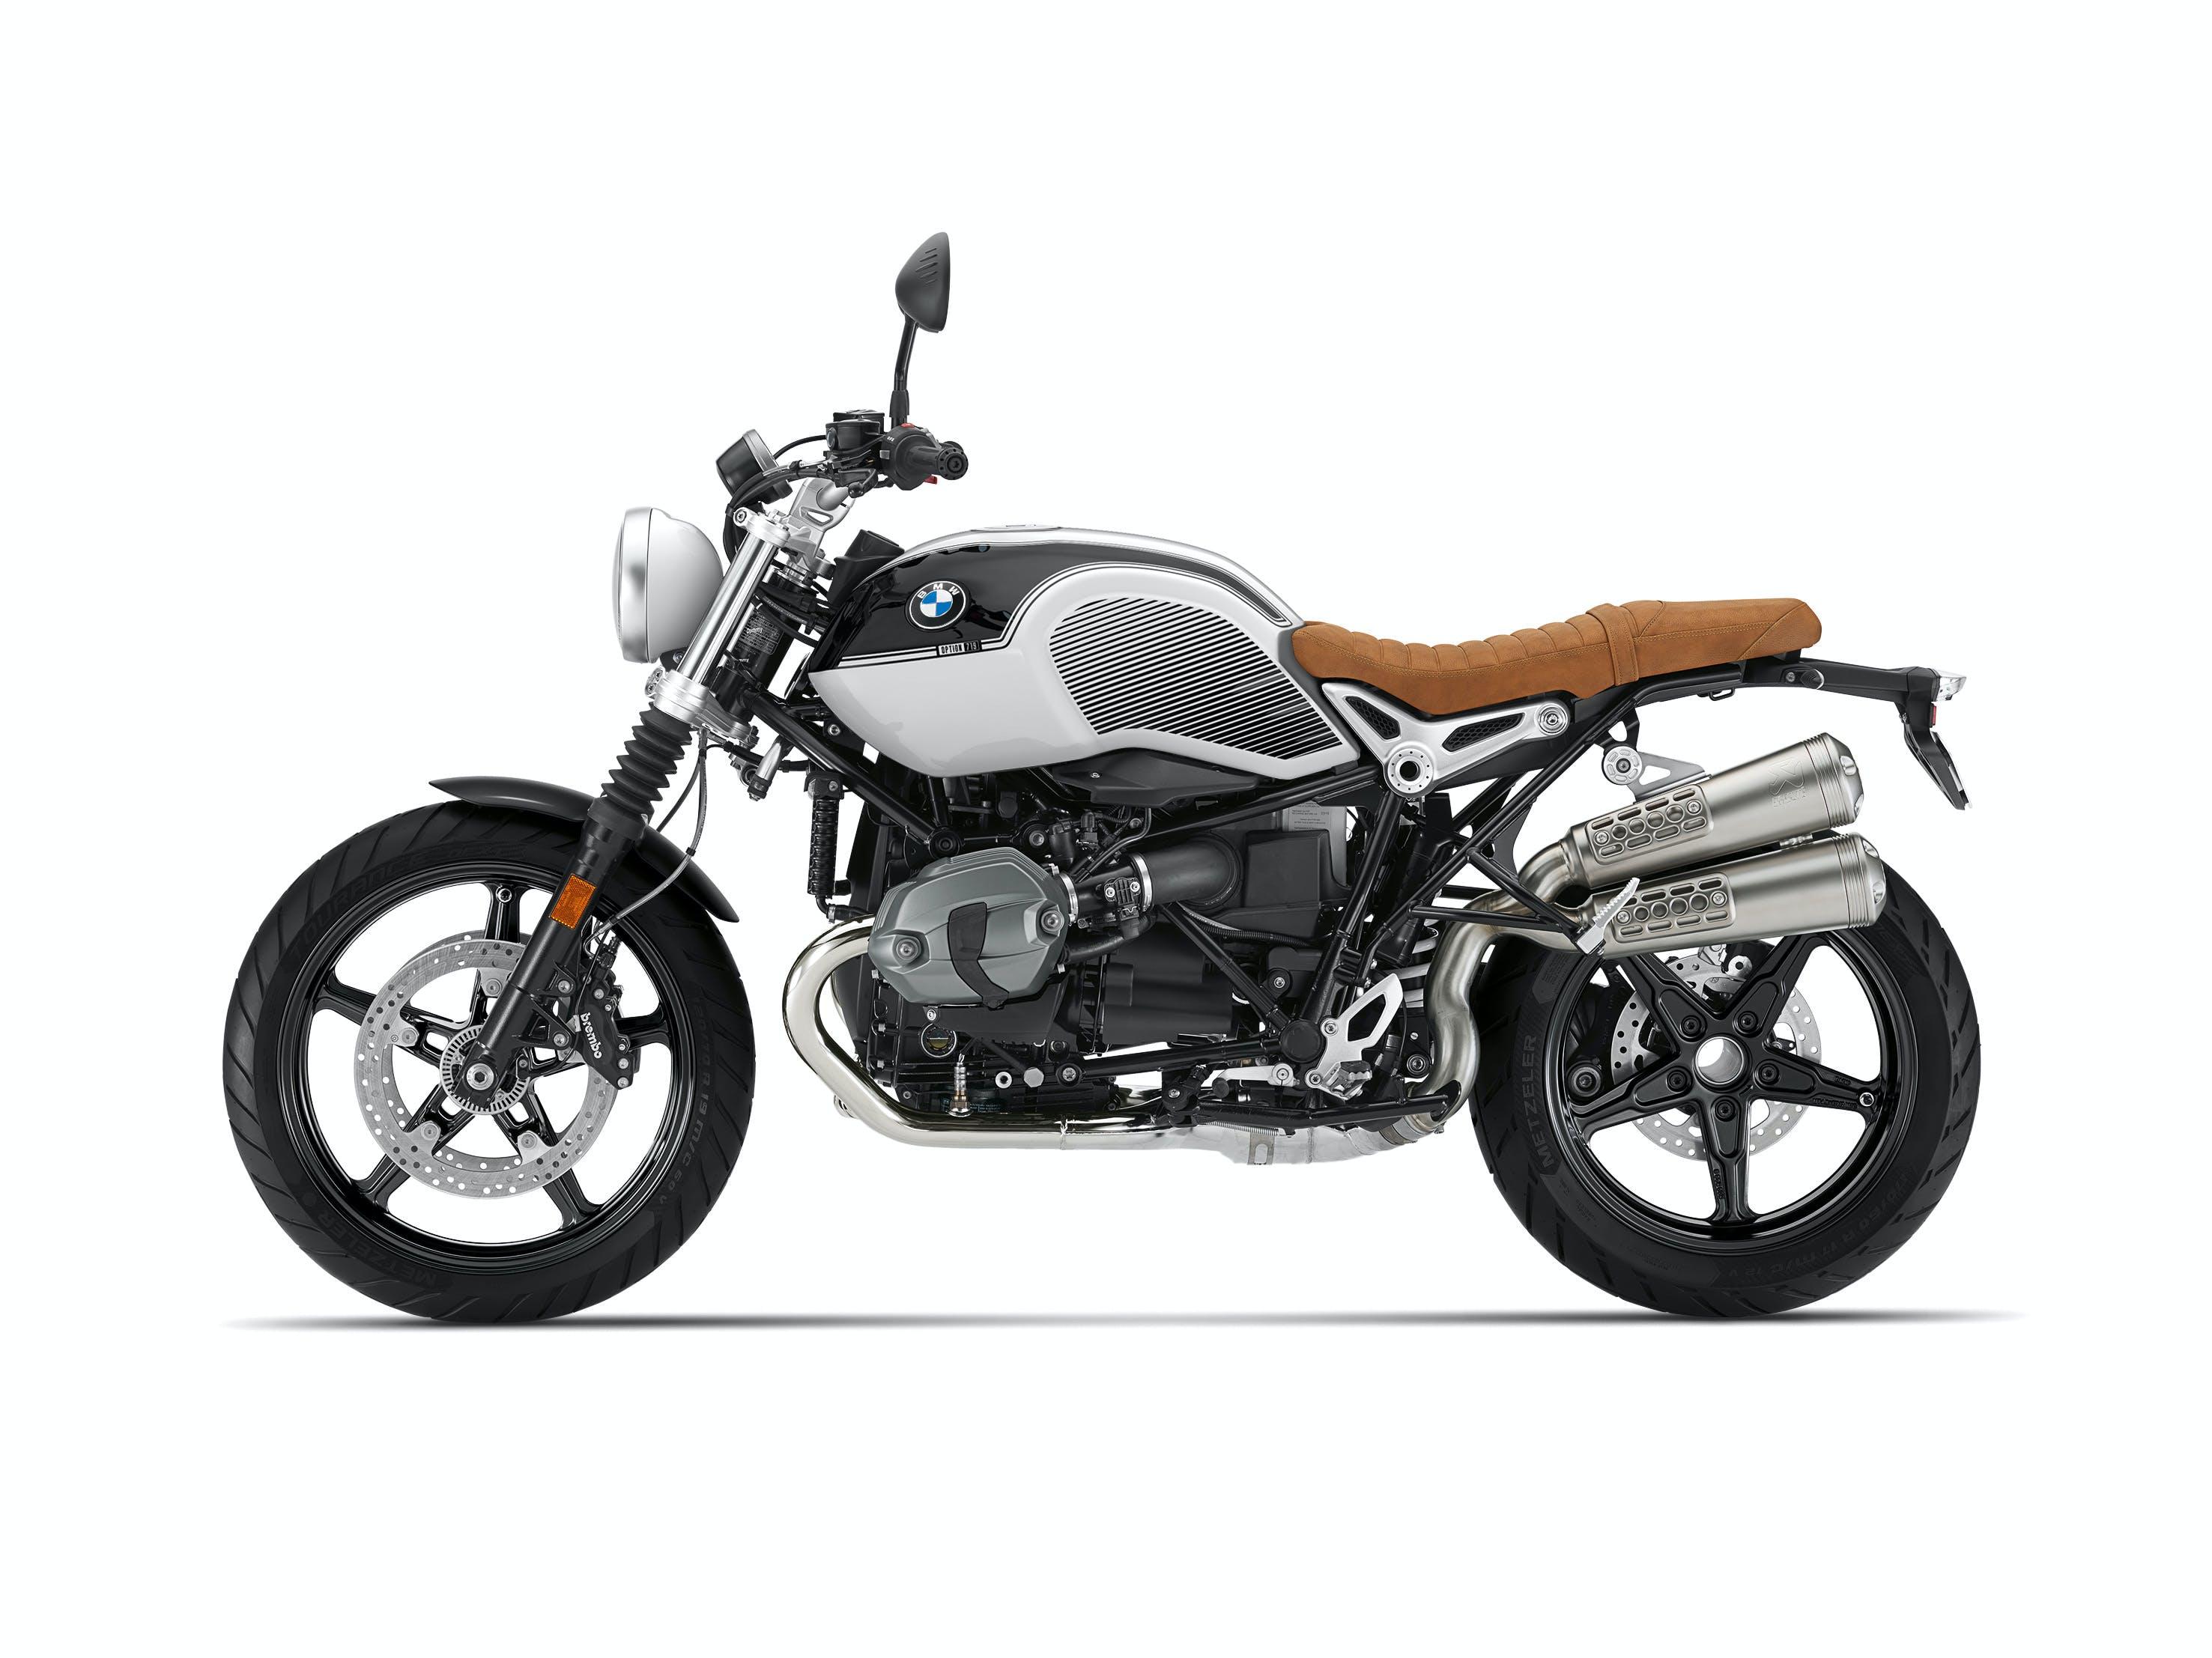 BMW R NINET SCRAMBLER SPEZIAL in opt 719 black storm metallic / light white colour